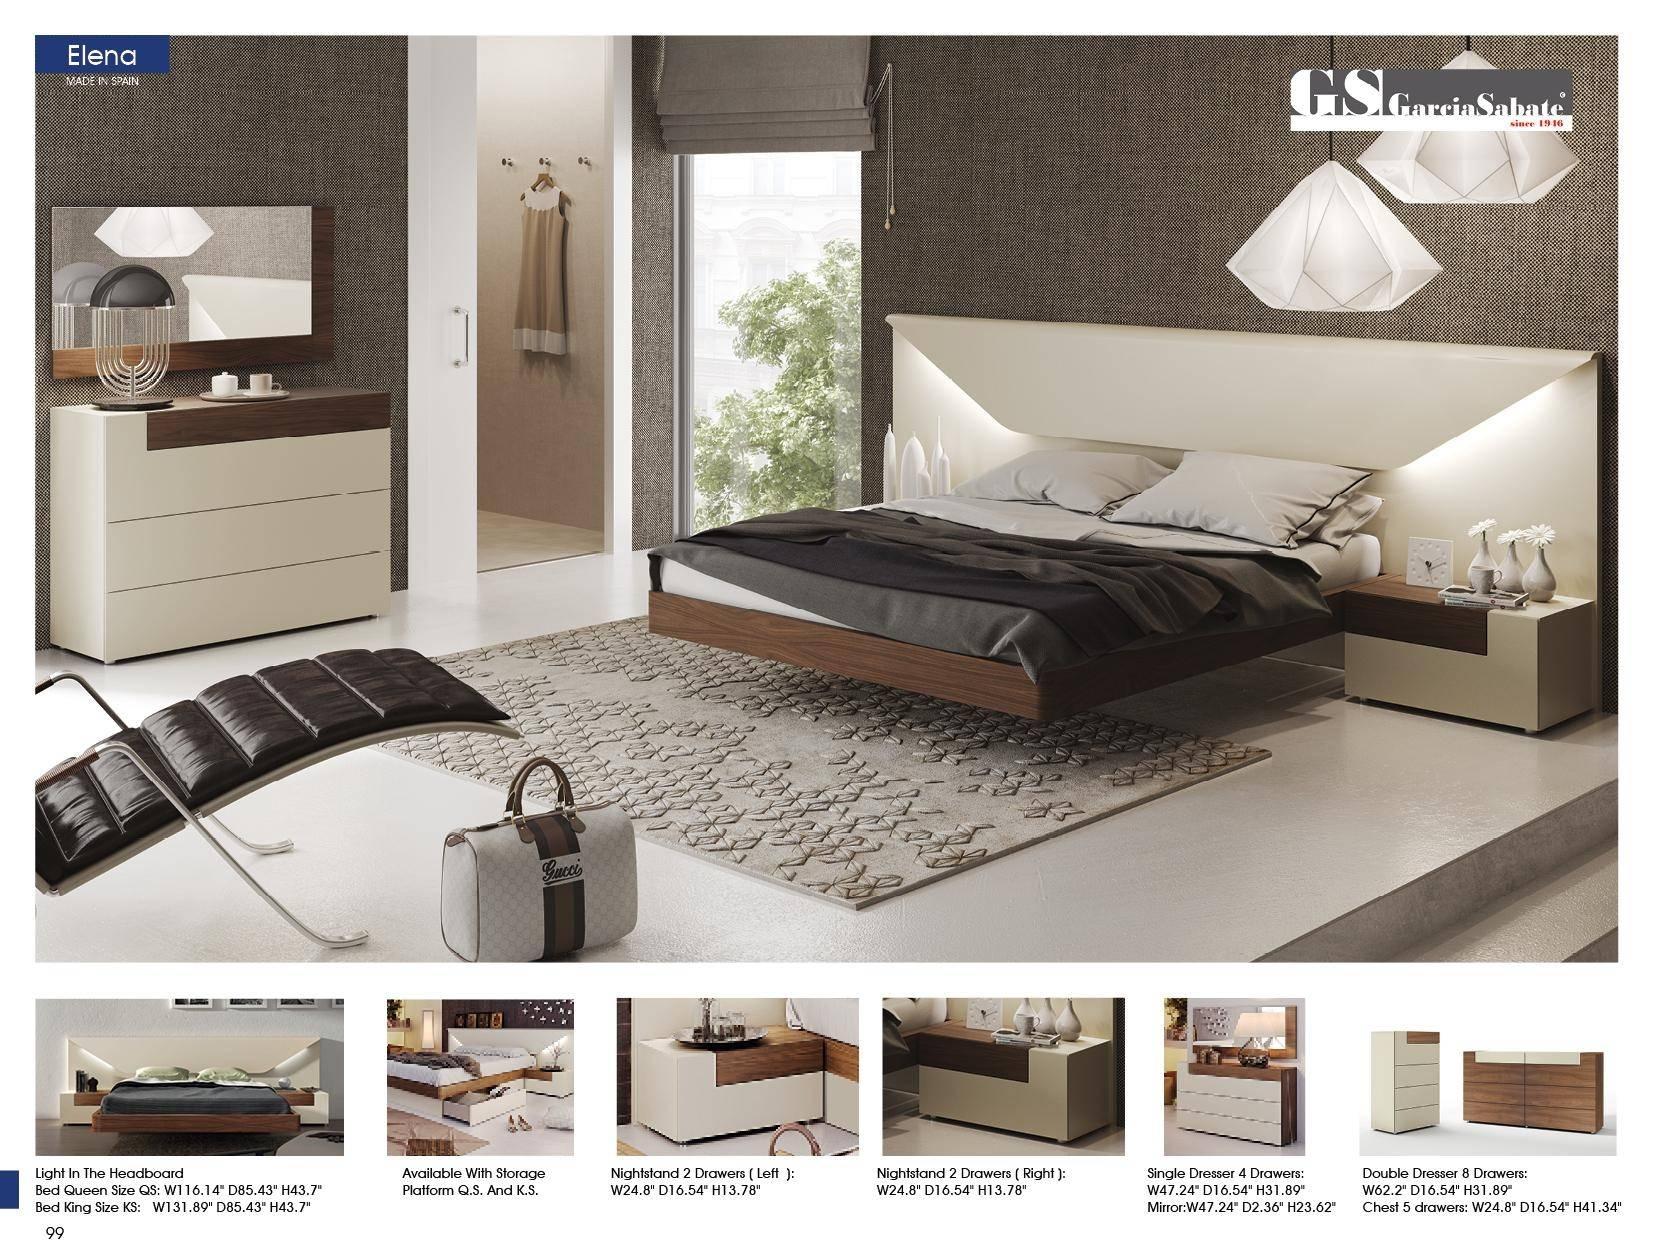 Picture of: Buy Esf Elena Queen Platform Bedroom Set 5 Pcs In White Walnut Matte Lacquer Online